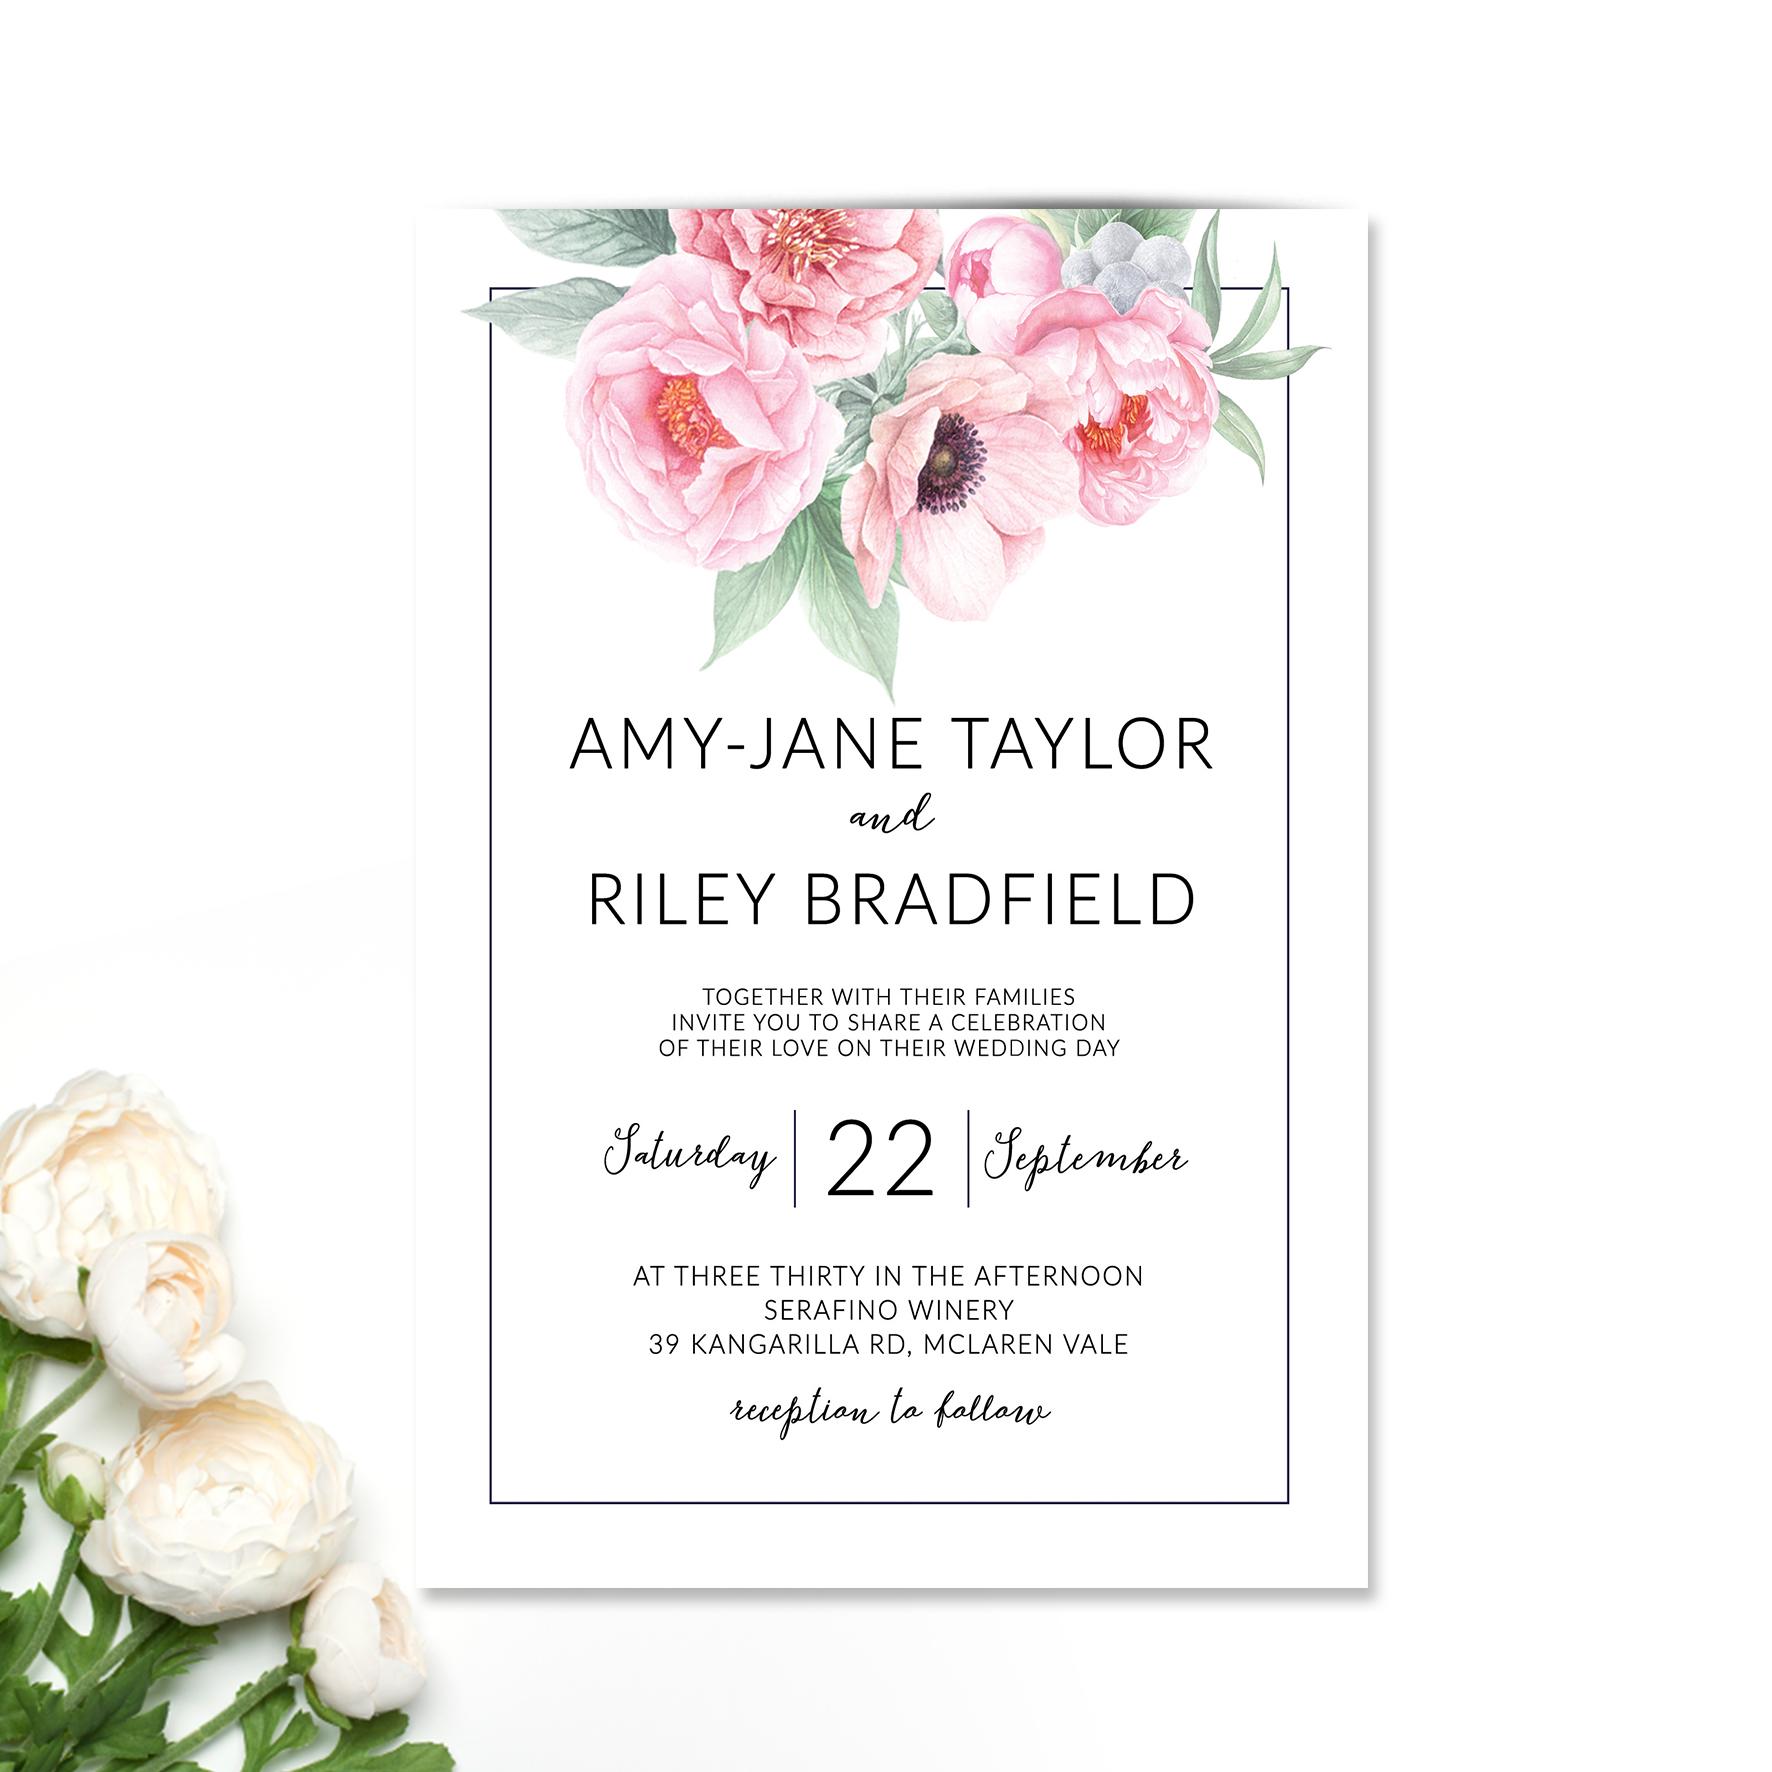 Amy-Jane + Riley Wedding Invitation